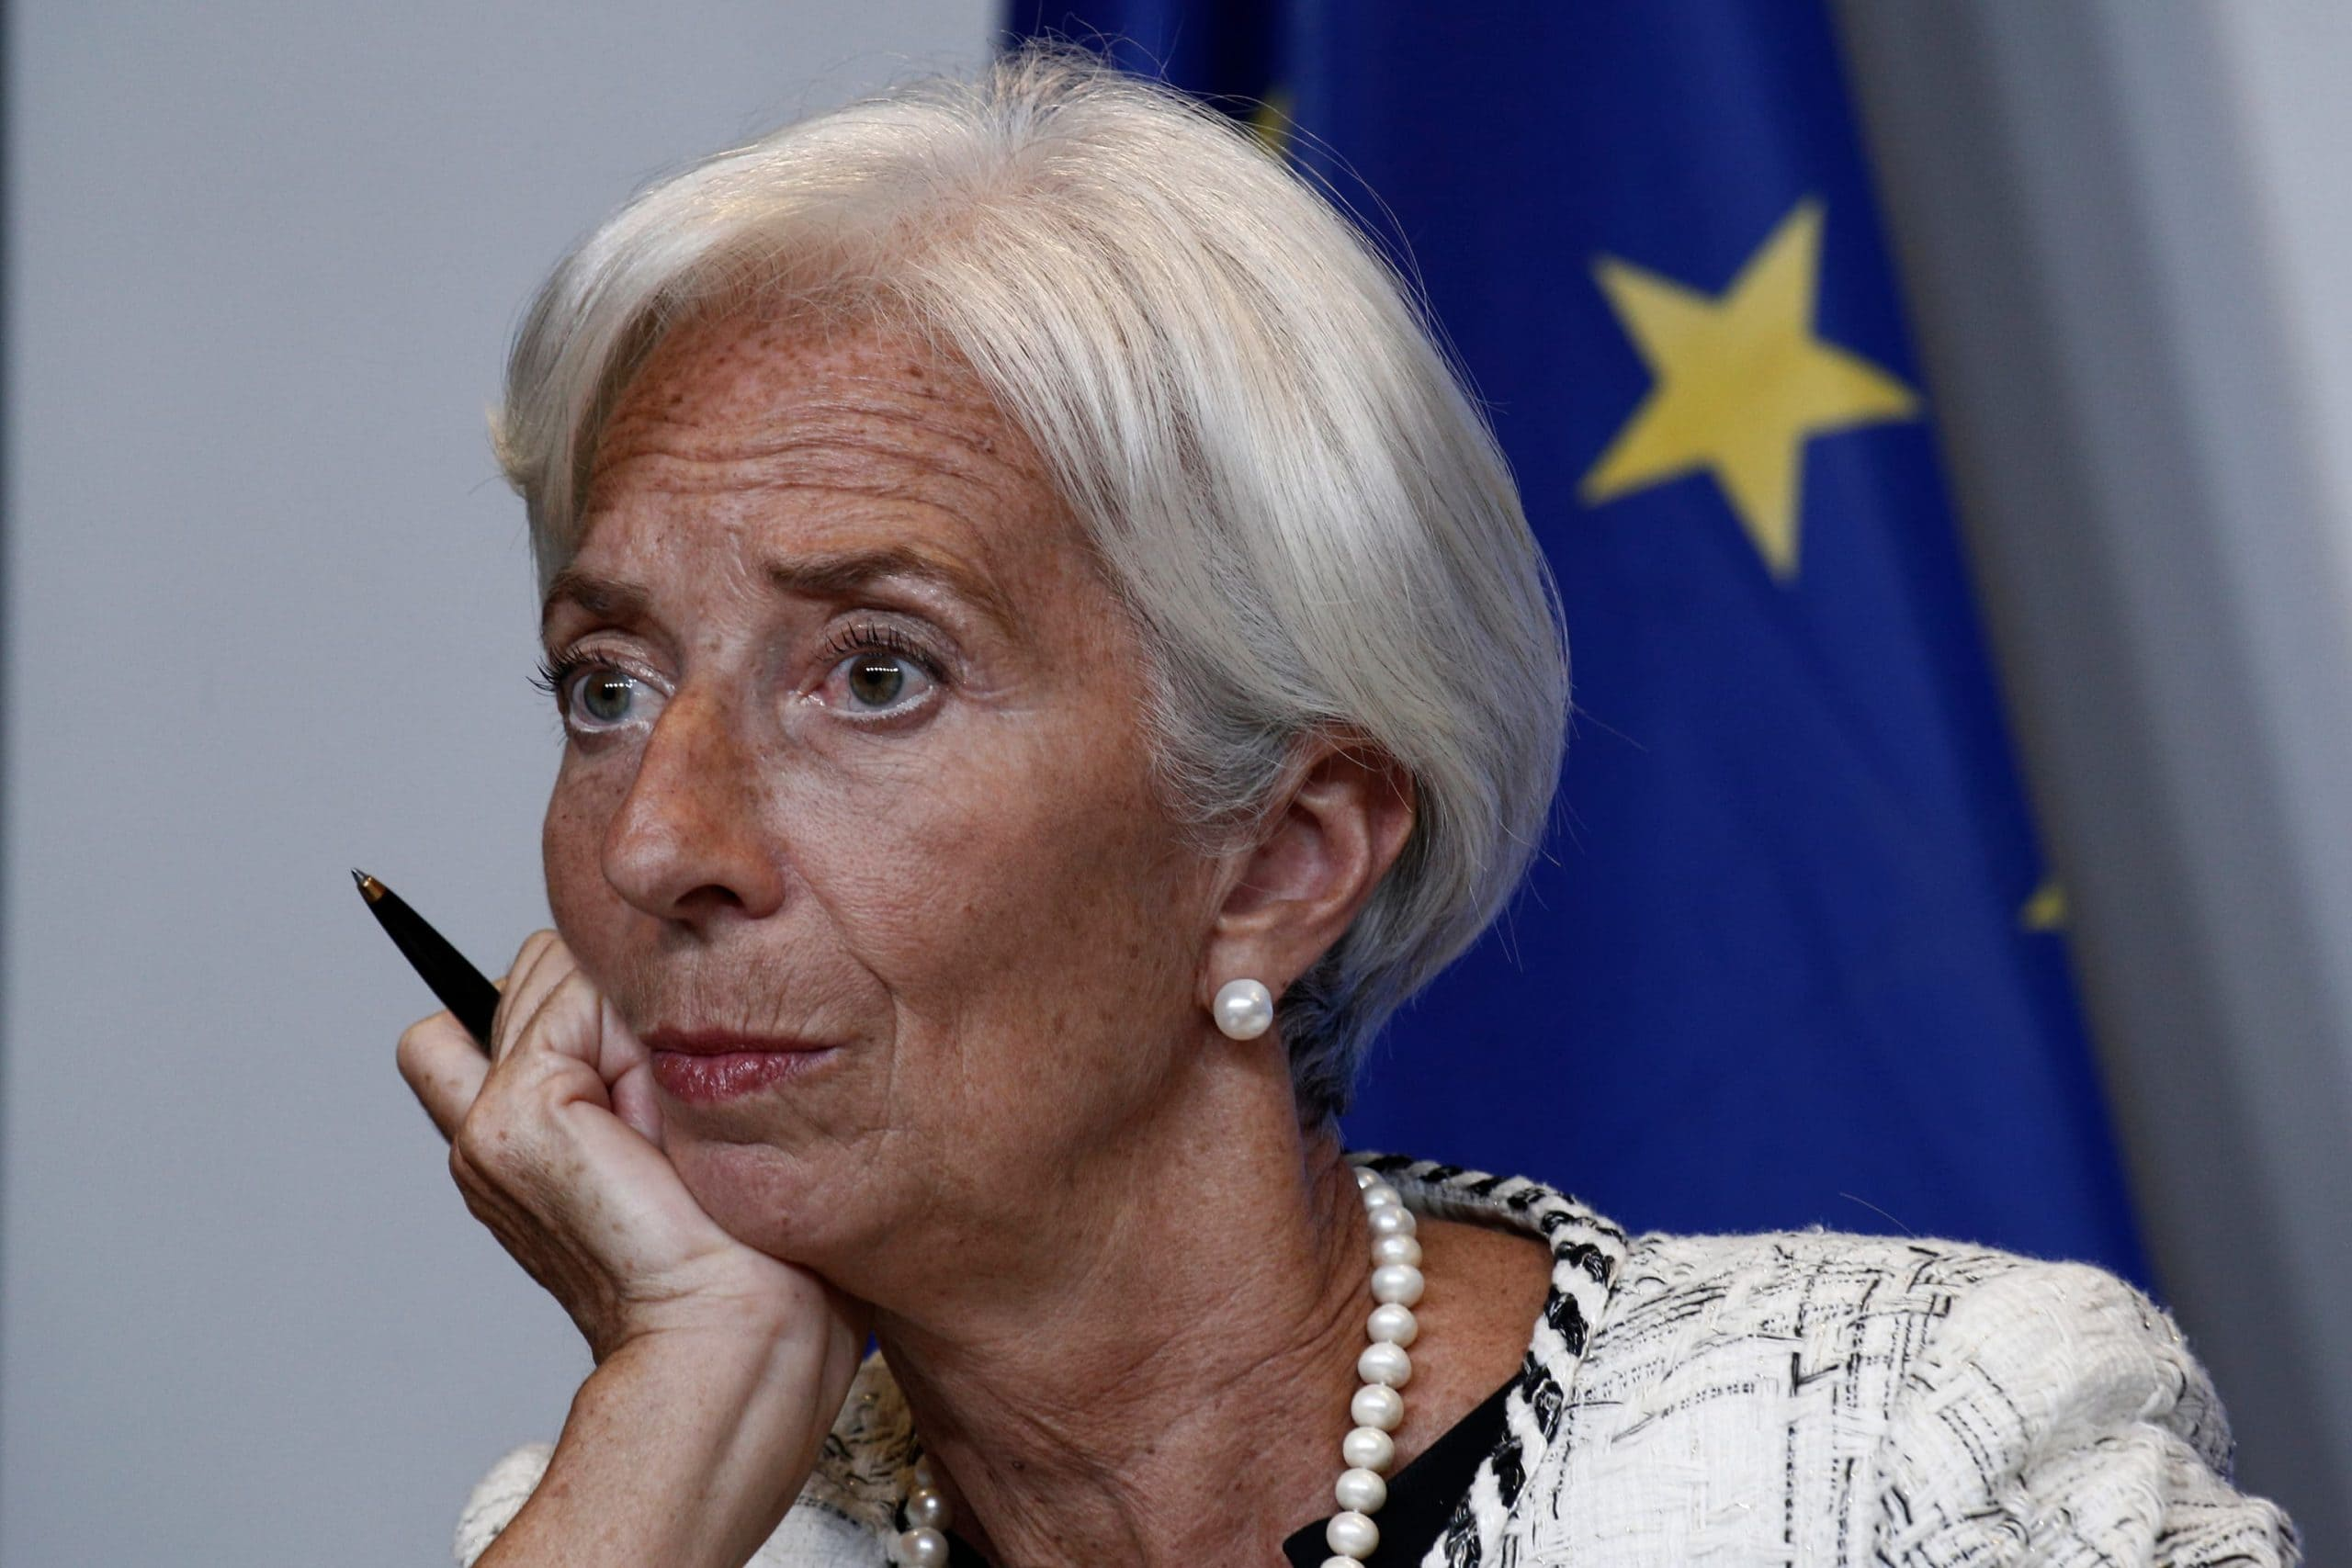 EZB-Chefin Christine Lagard in nachdenklicher Pose